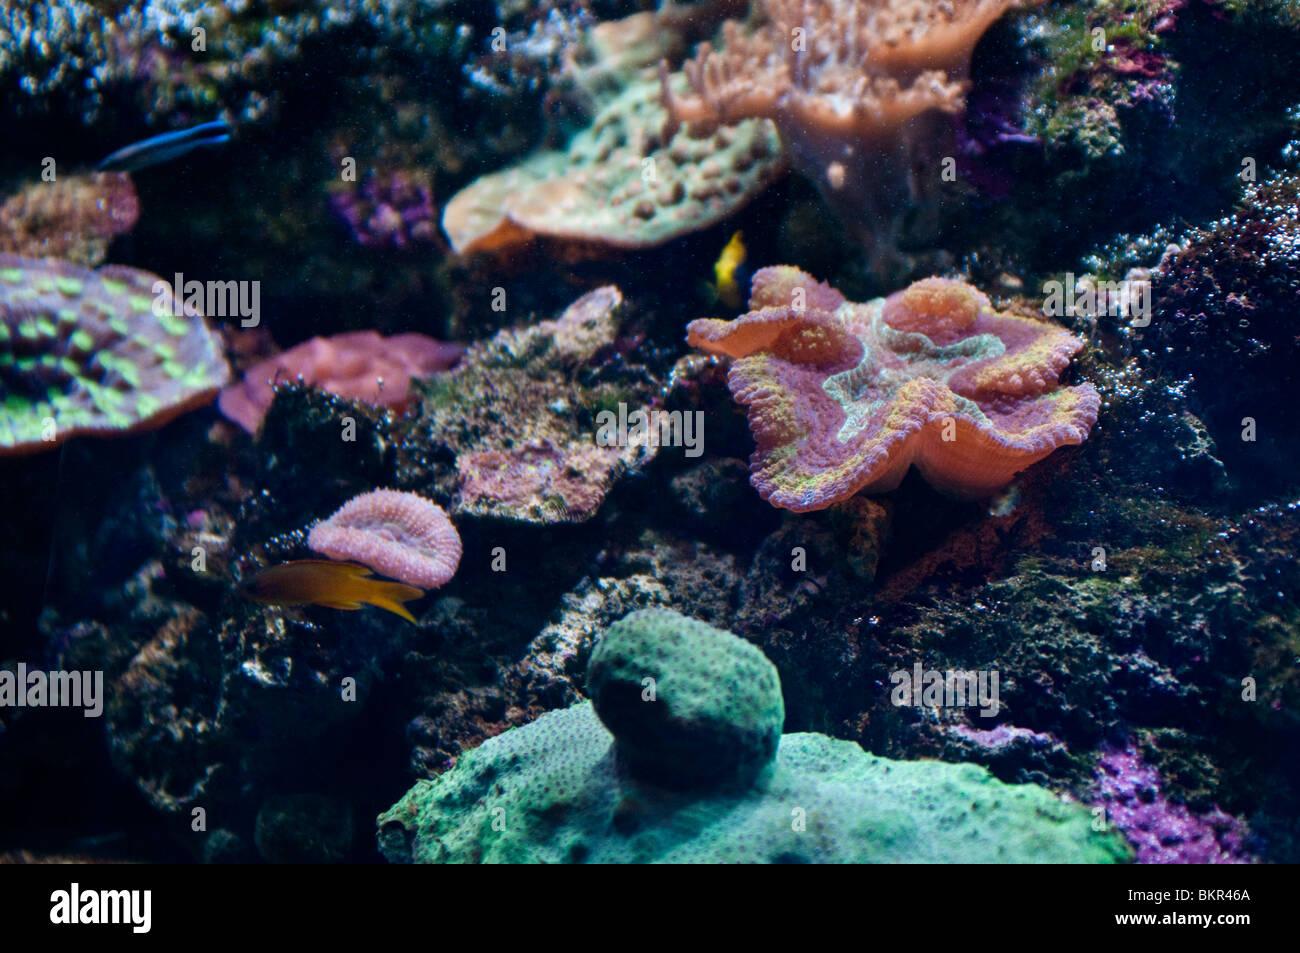 Great Barrier Reef corals, Sydney Aquarium, Sydney, Australia - Stock Image